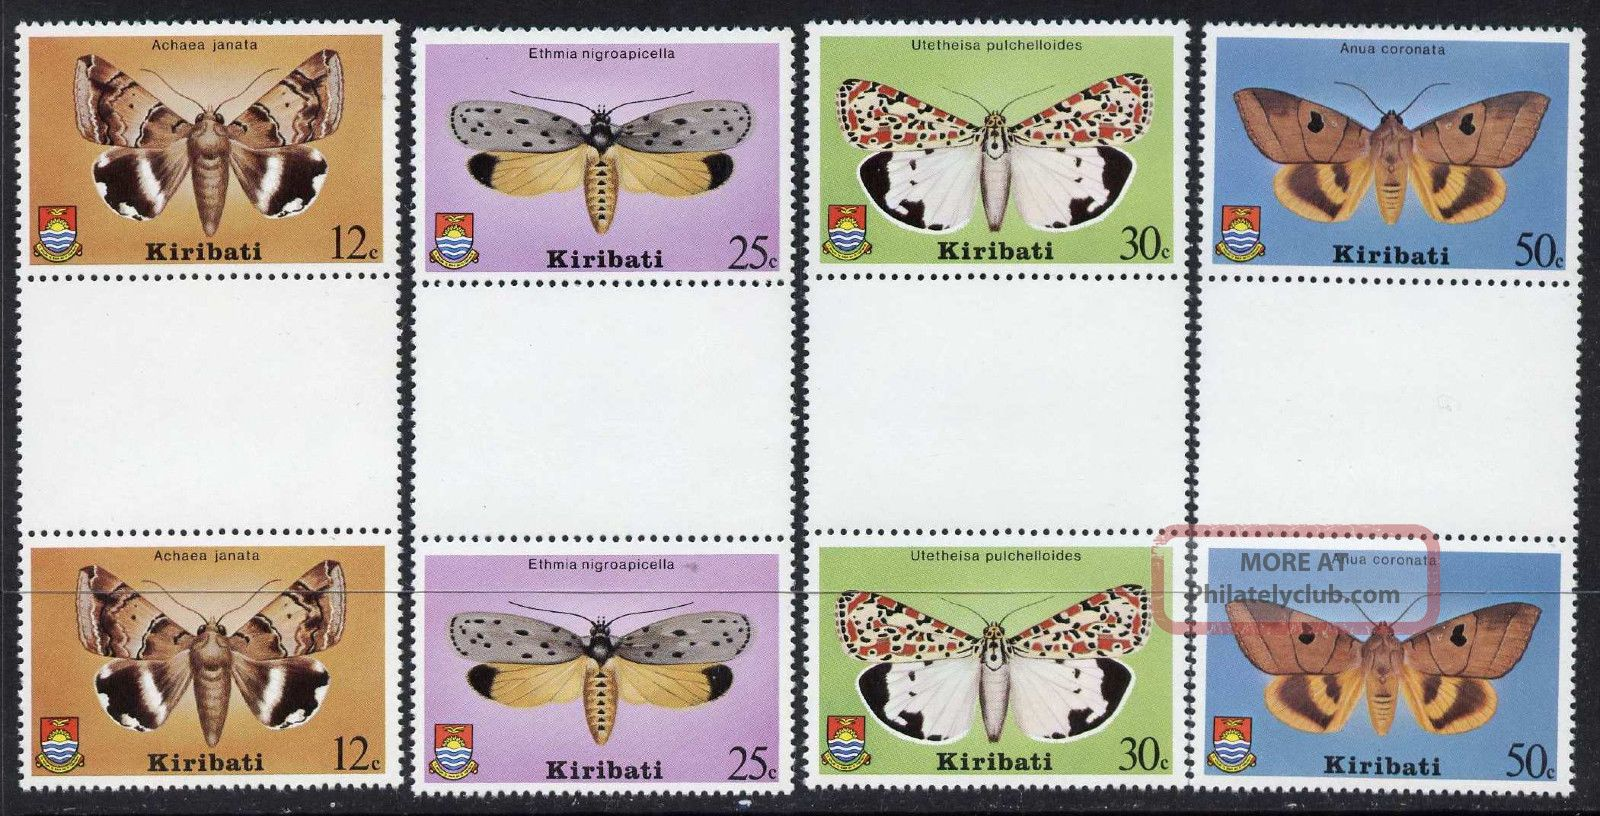 Kiribati 356 - 9 Gutter Pairs Butterfly Australia & Oceania photo